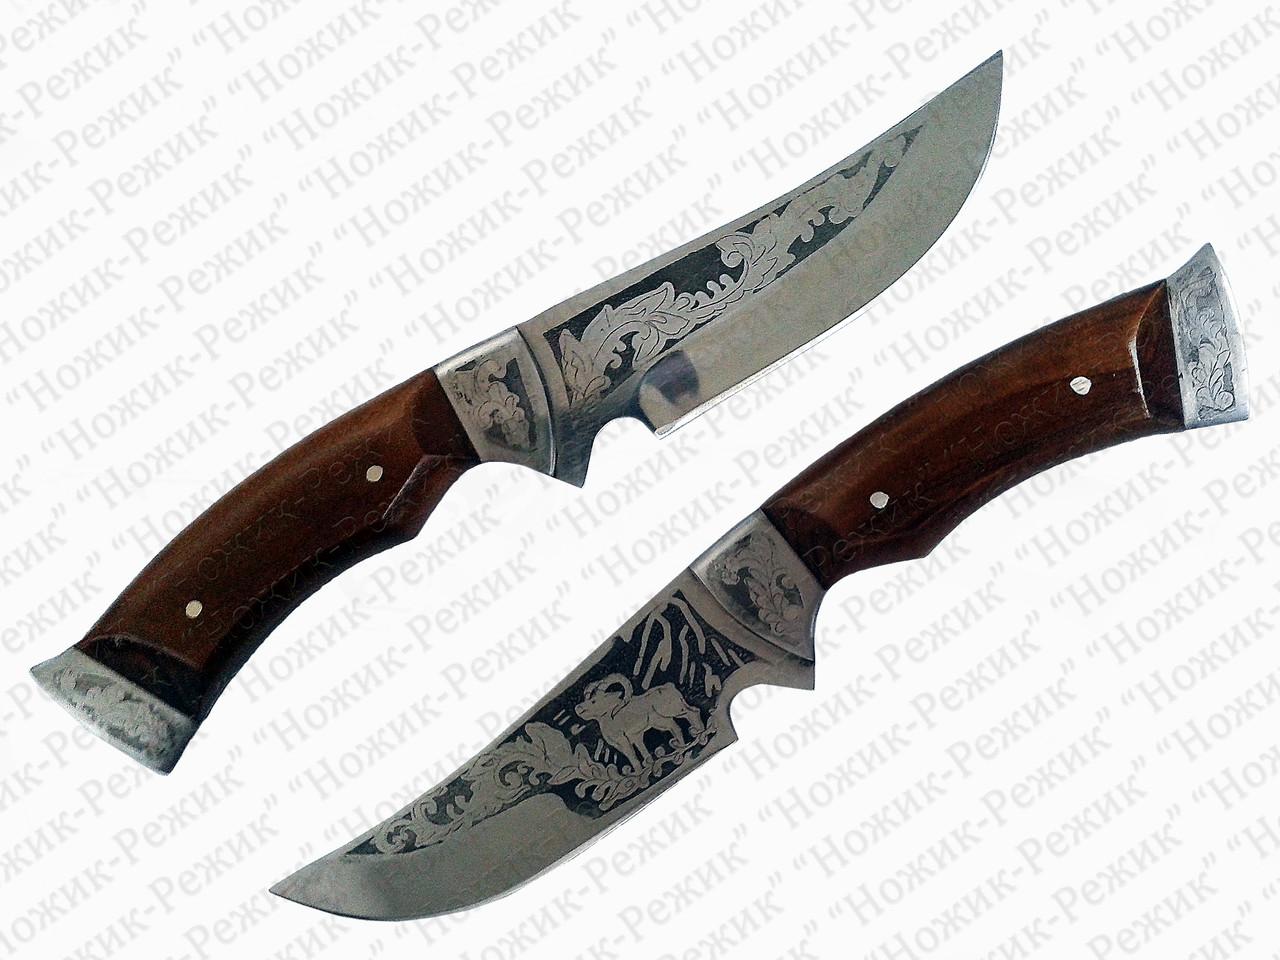 Туристический нож, охотничий нож, нож АТО, нож для рыбалки